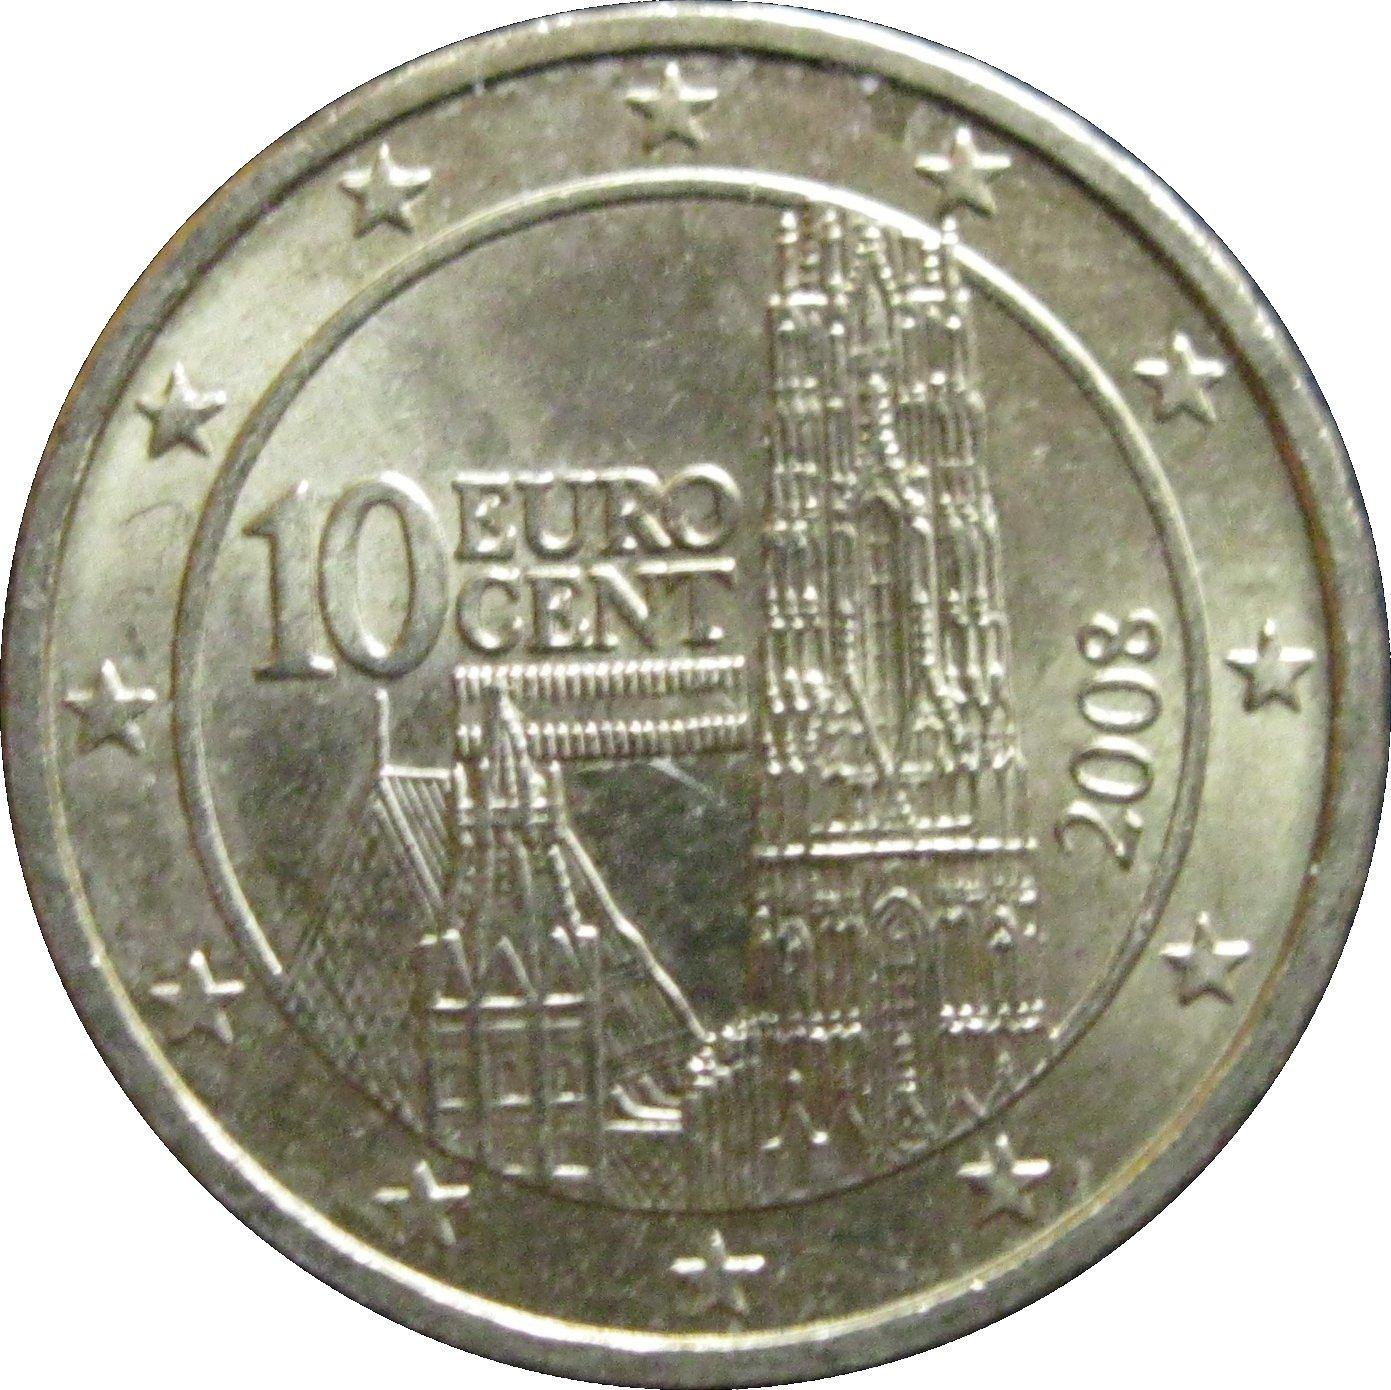 10 Euro Cent (2nd map) - Austria – Numista